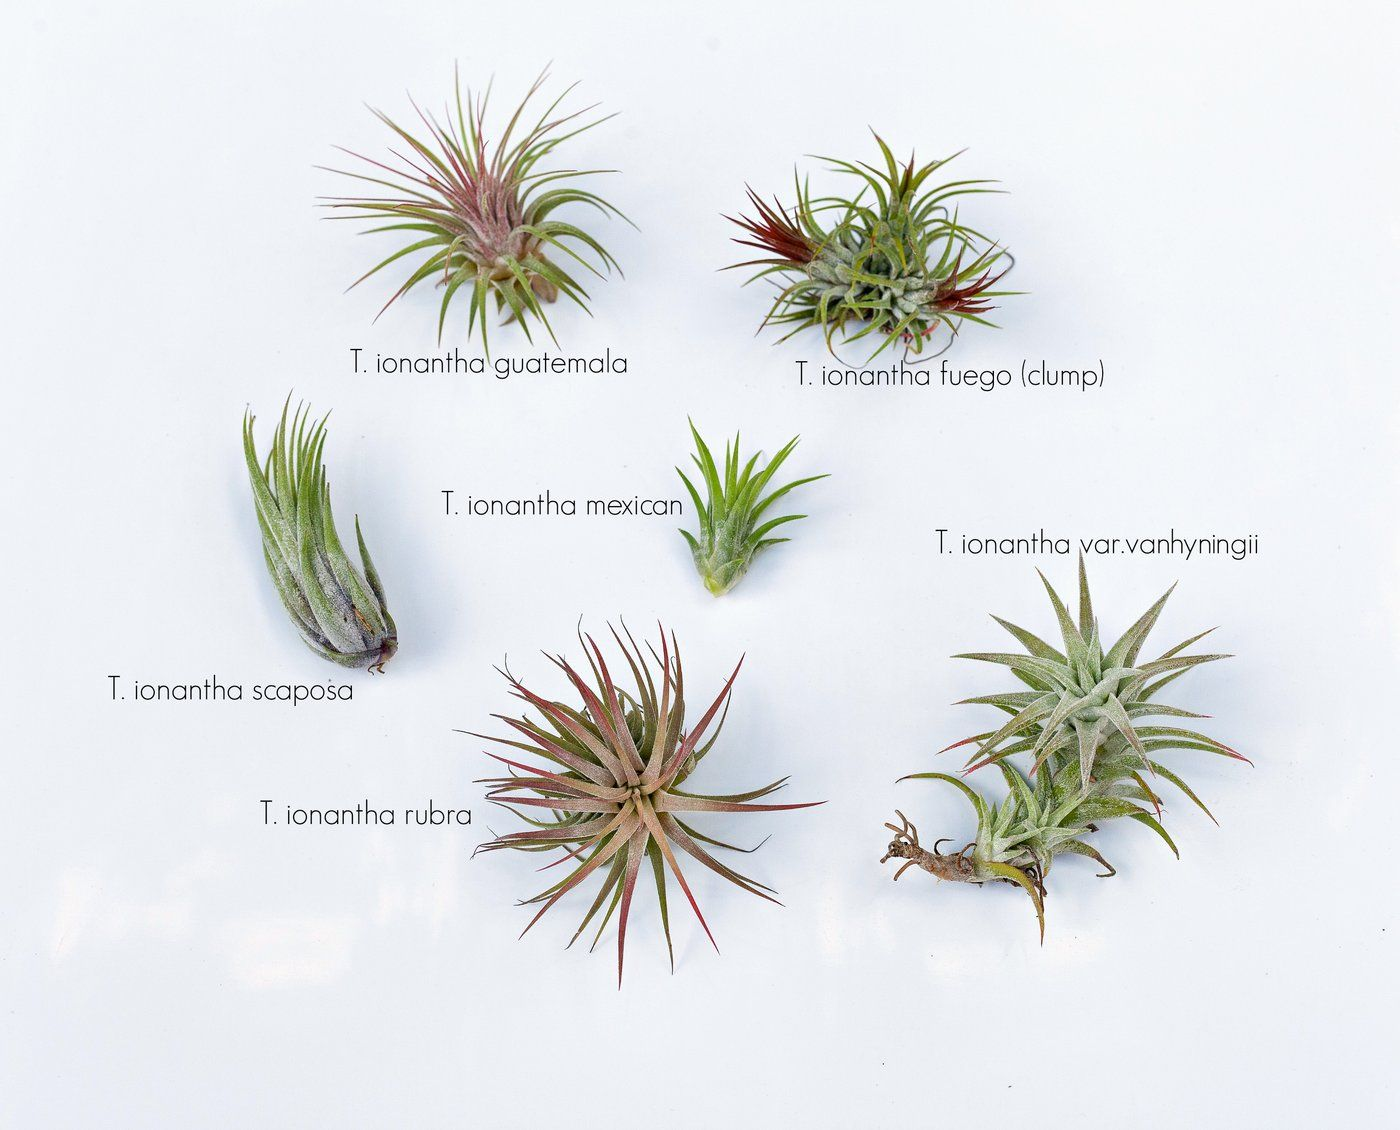 Common Tillandsia Ionantha Forms Air Plants Air Plants Care Air